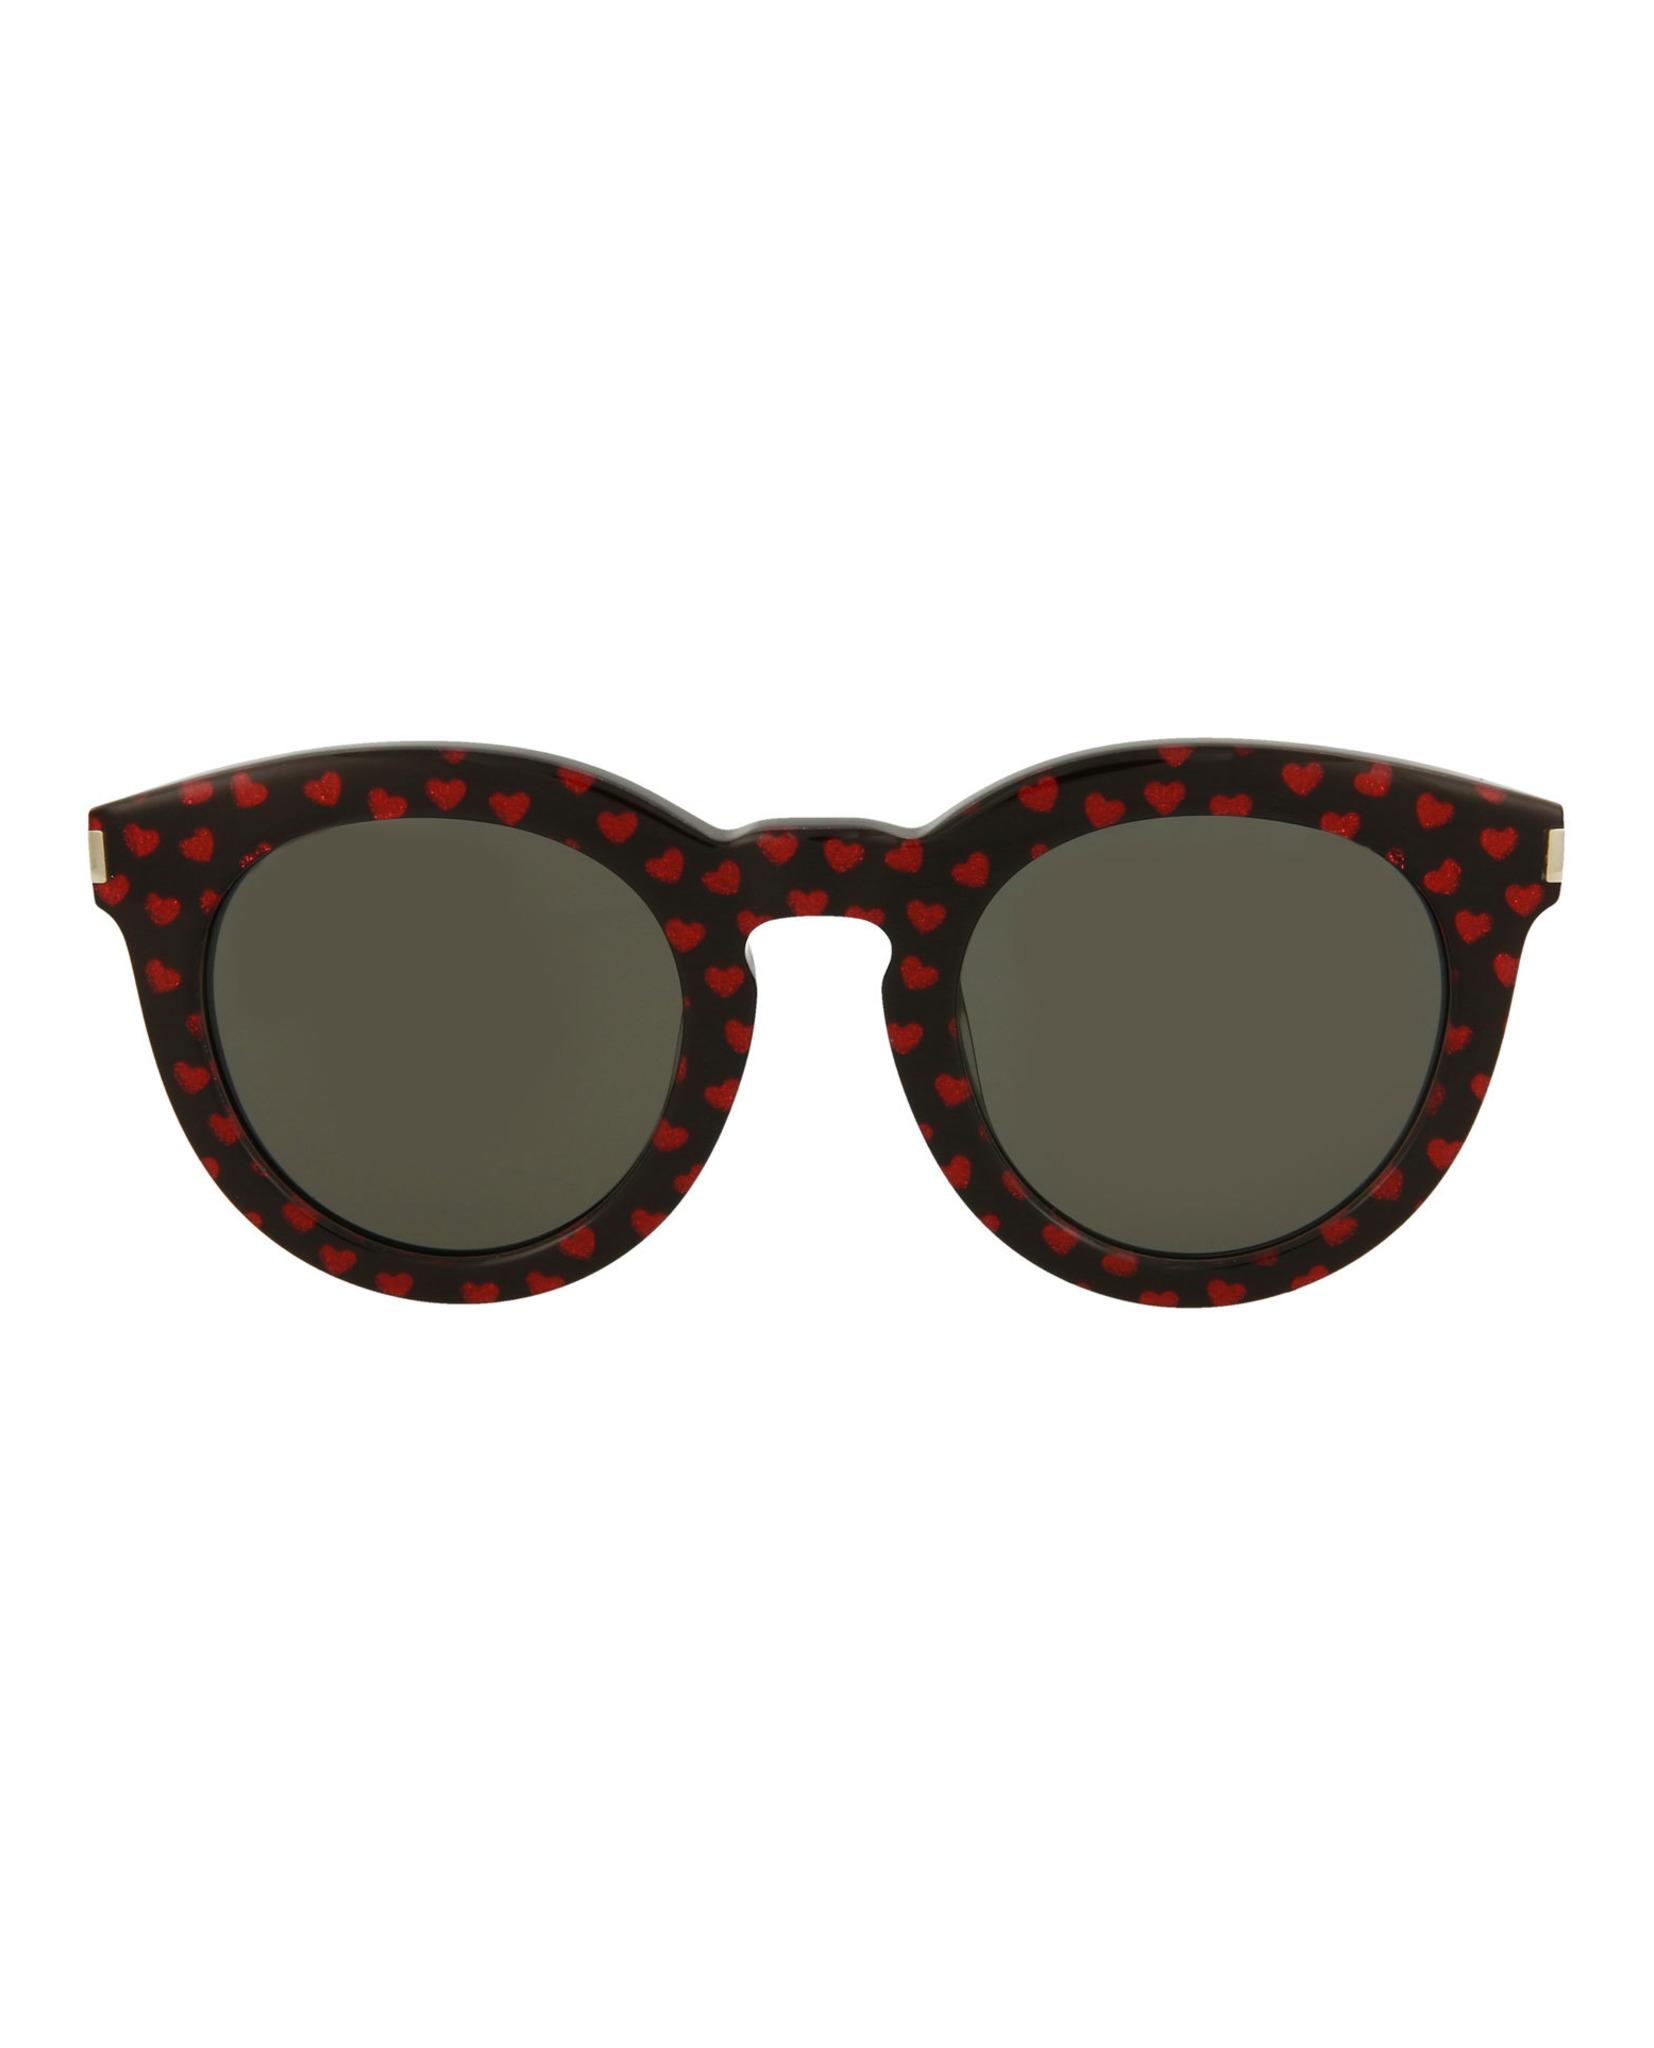 a0fa6bcd4887 Saint Laurent Unisex Round/Oval Sunglasses SL102-30000453-005 ...